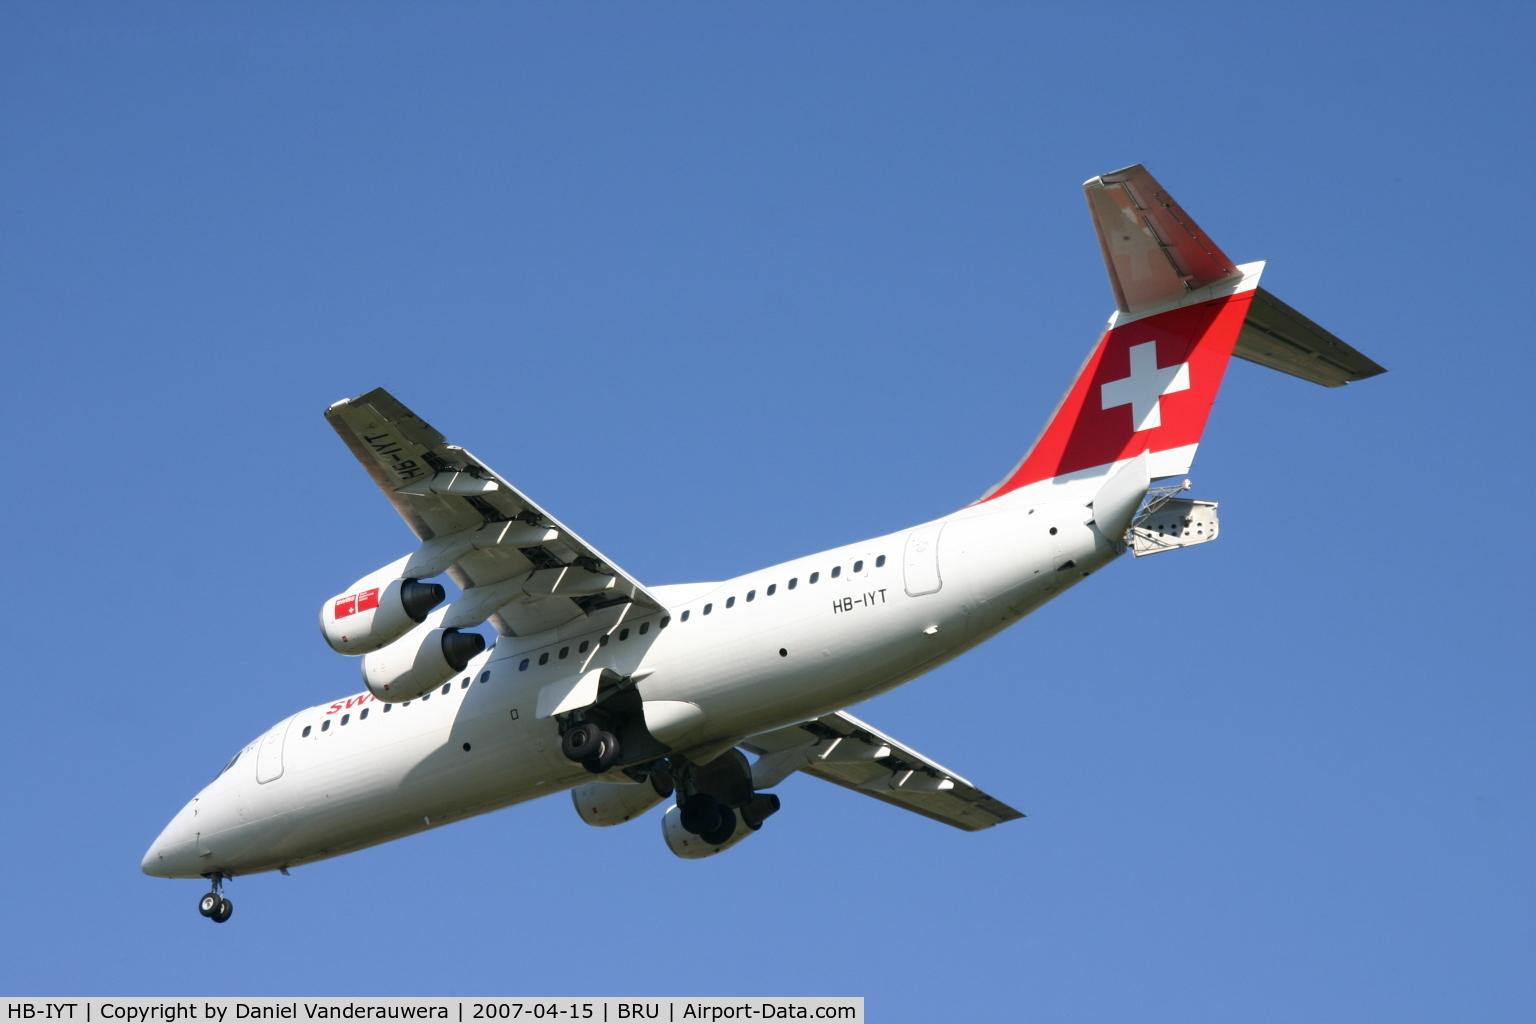 HB-IYT, 2000 British Aerospace Avro 146-RJ100 C/N E3380, descending to rwy 25R